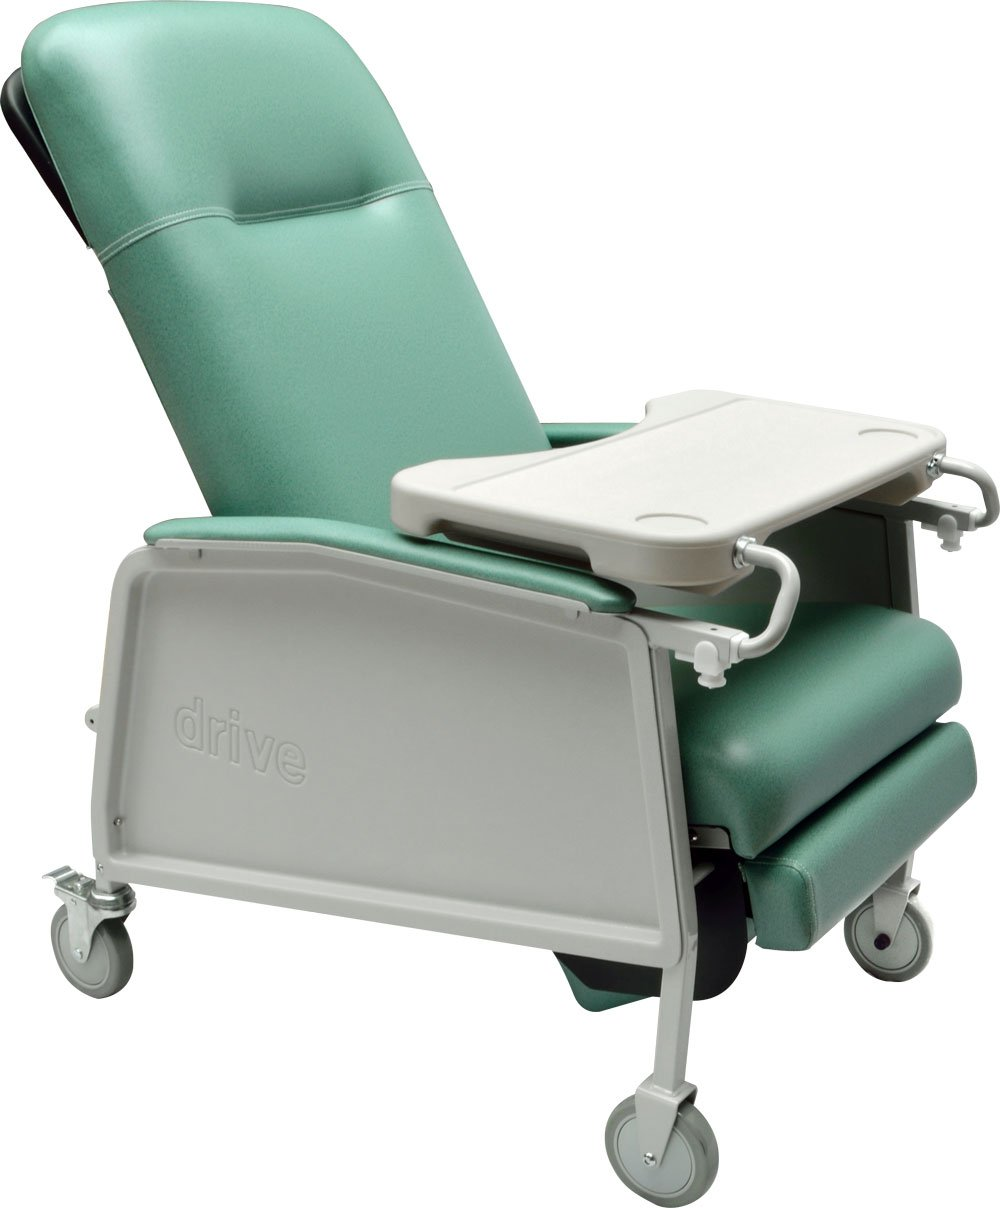 Drive Medical 3 Position Geri Chair Recliner, Jade